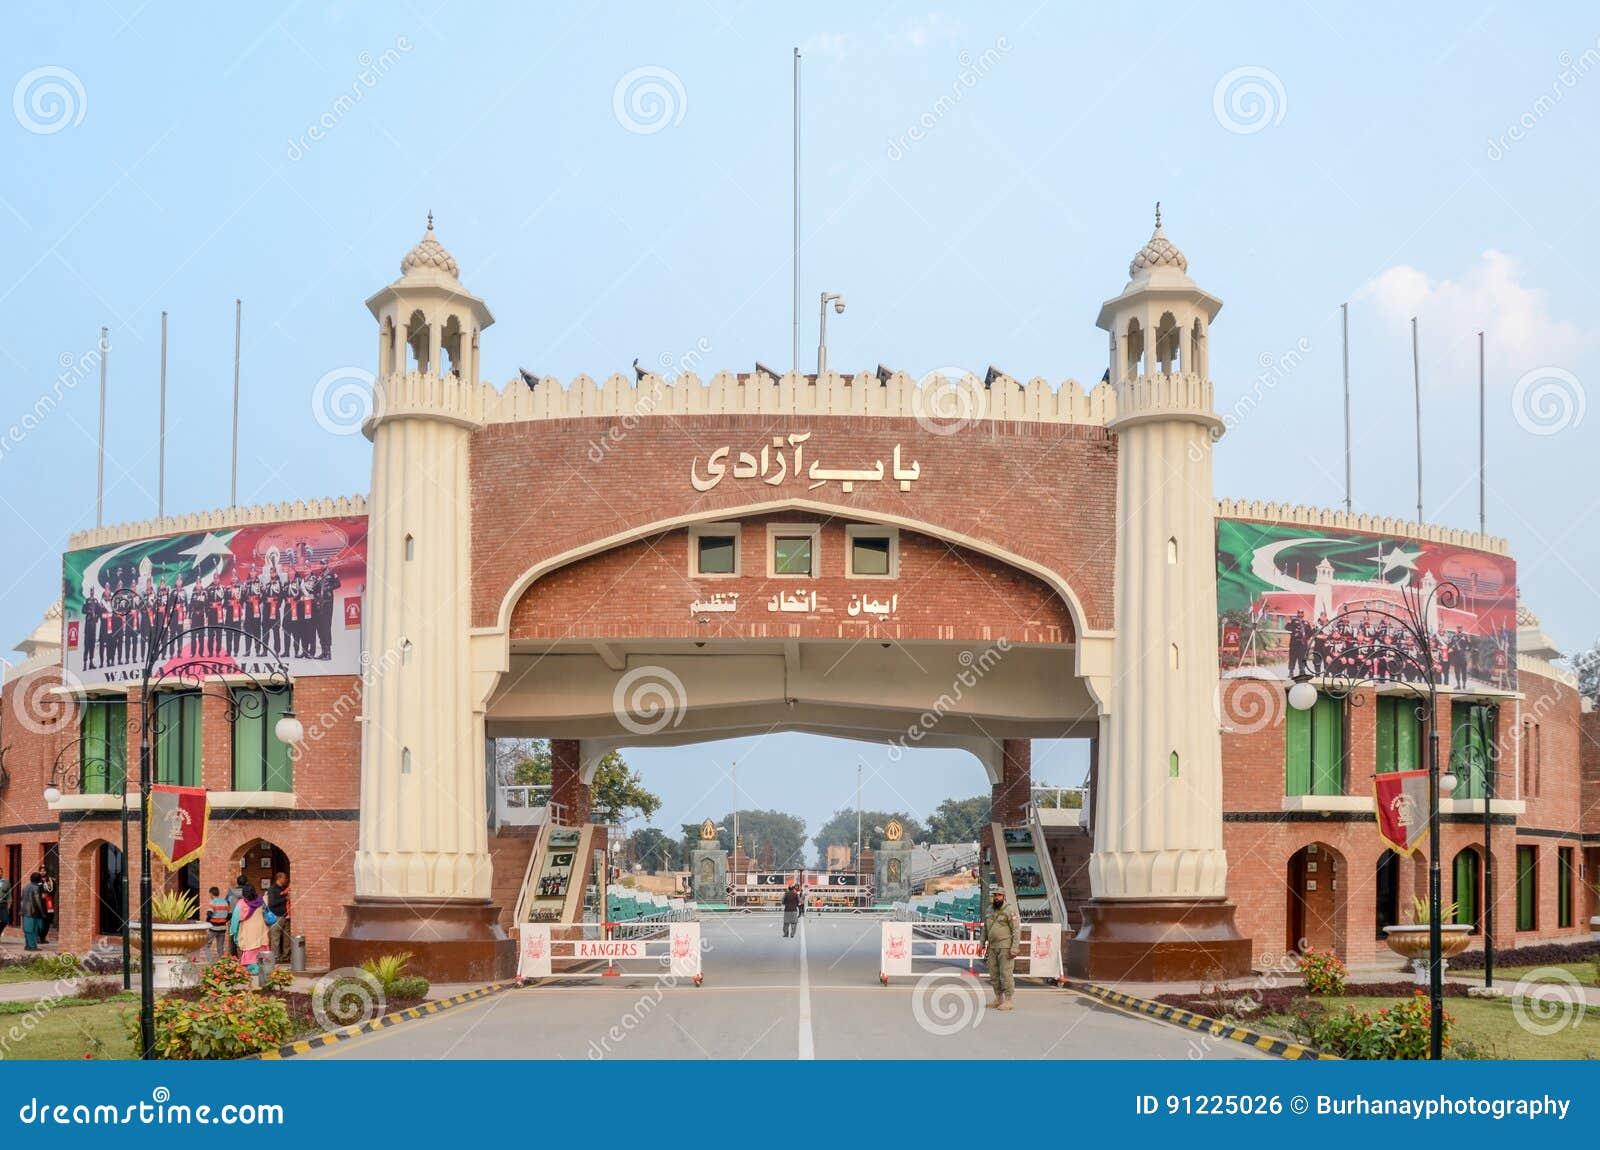 Wagah Border, Pakistan India Border, Lahore Pakistan On 28